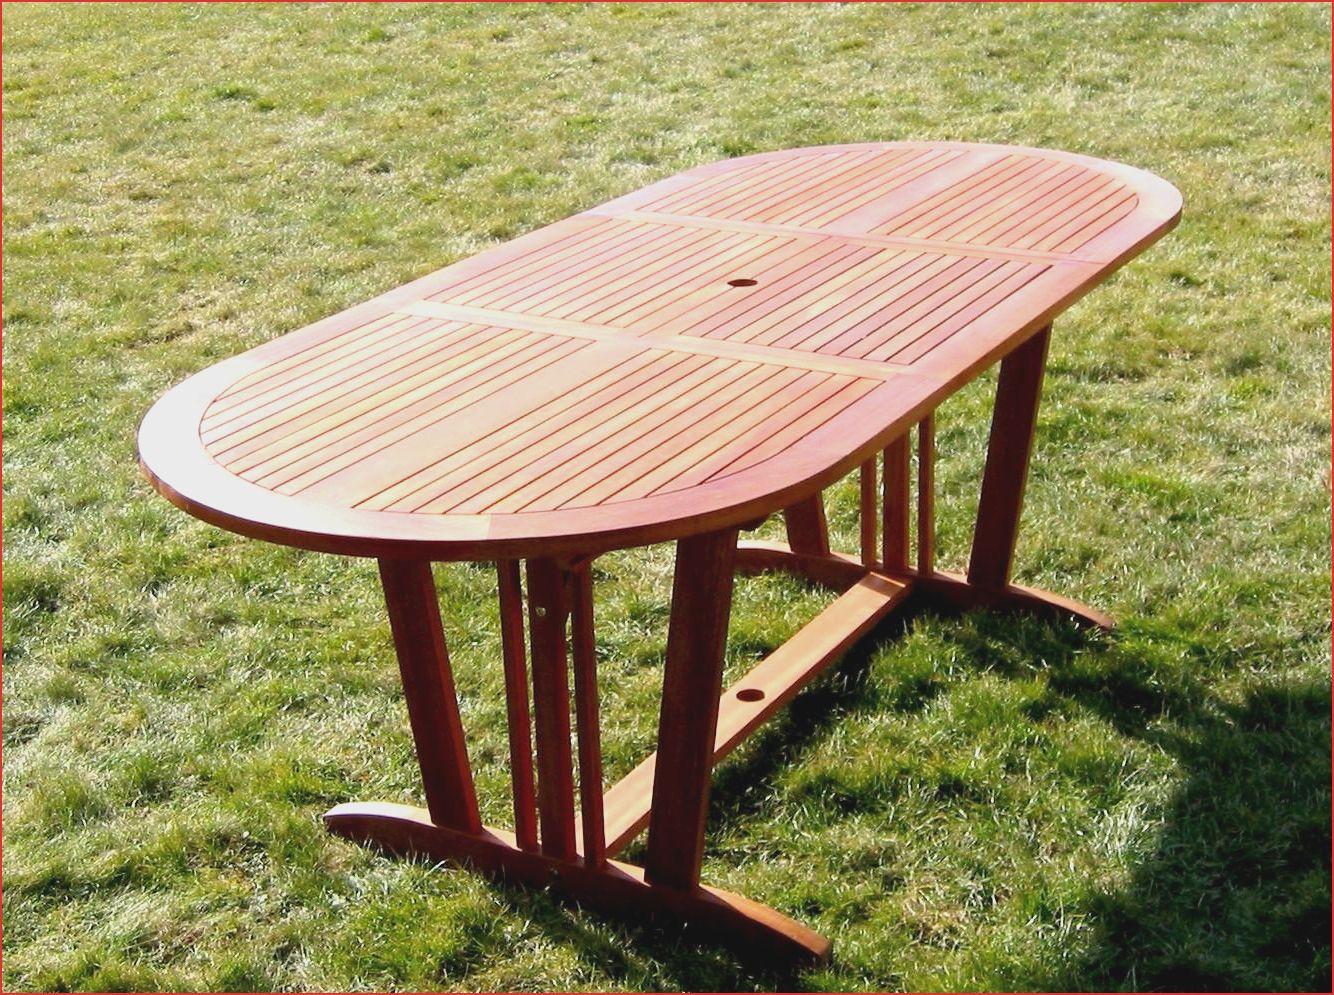 Garten Konzept 28 Luxus Gartentisch Oval Kunststoff O38p